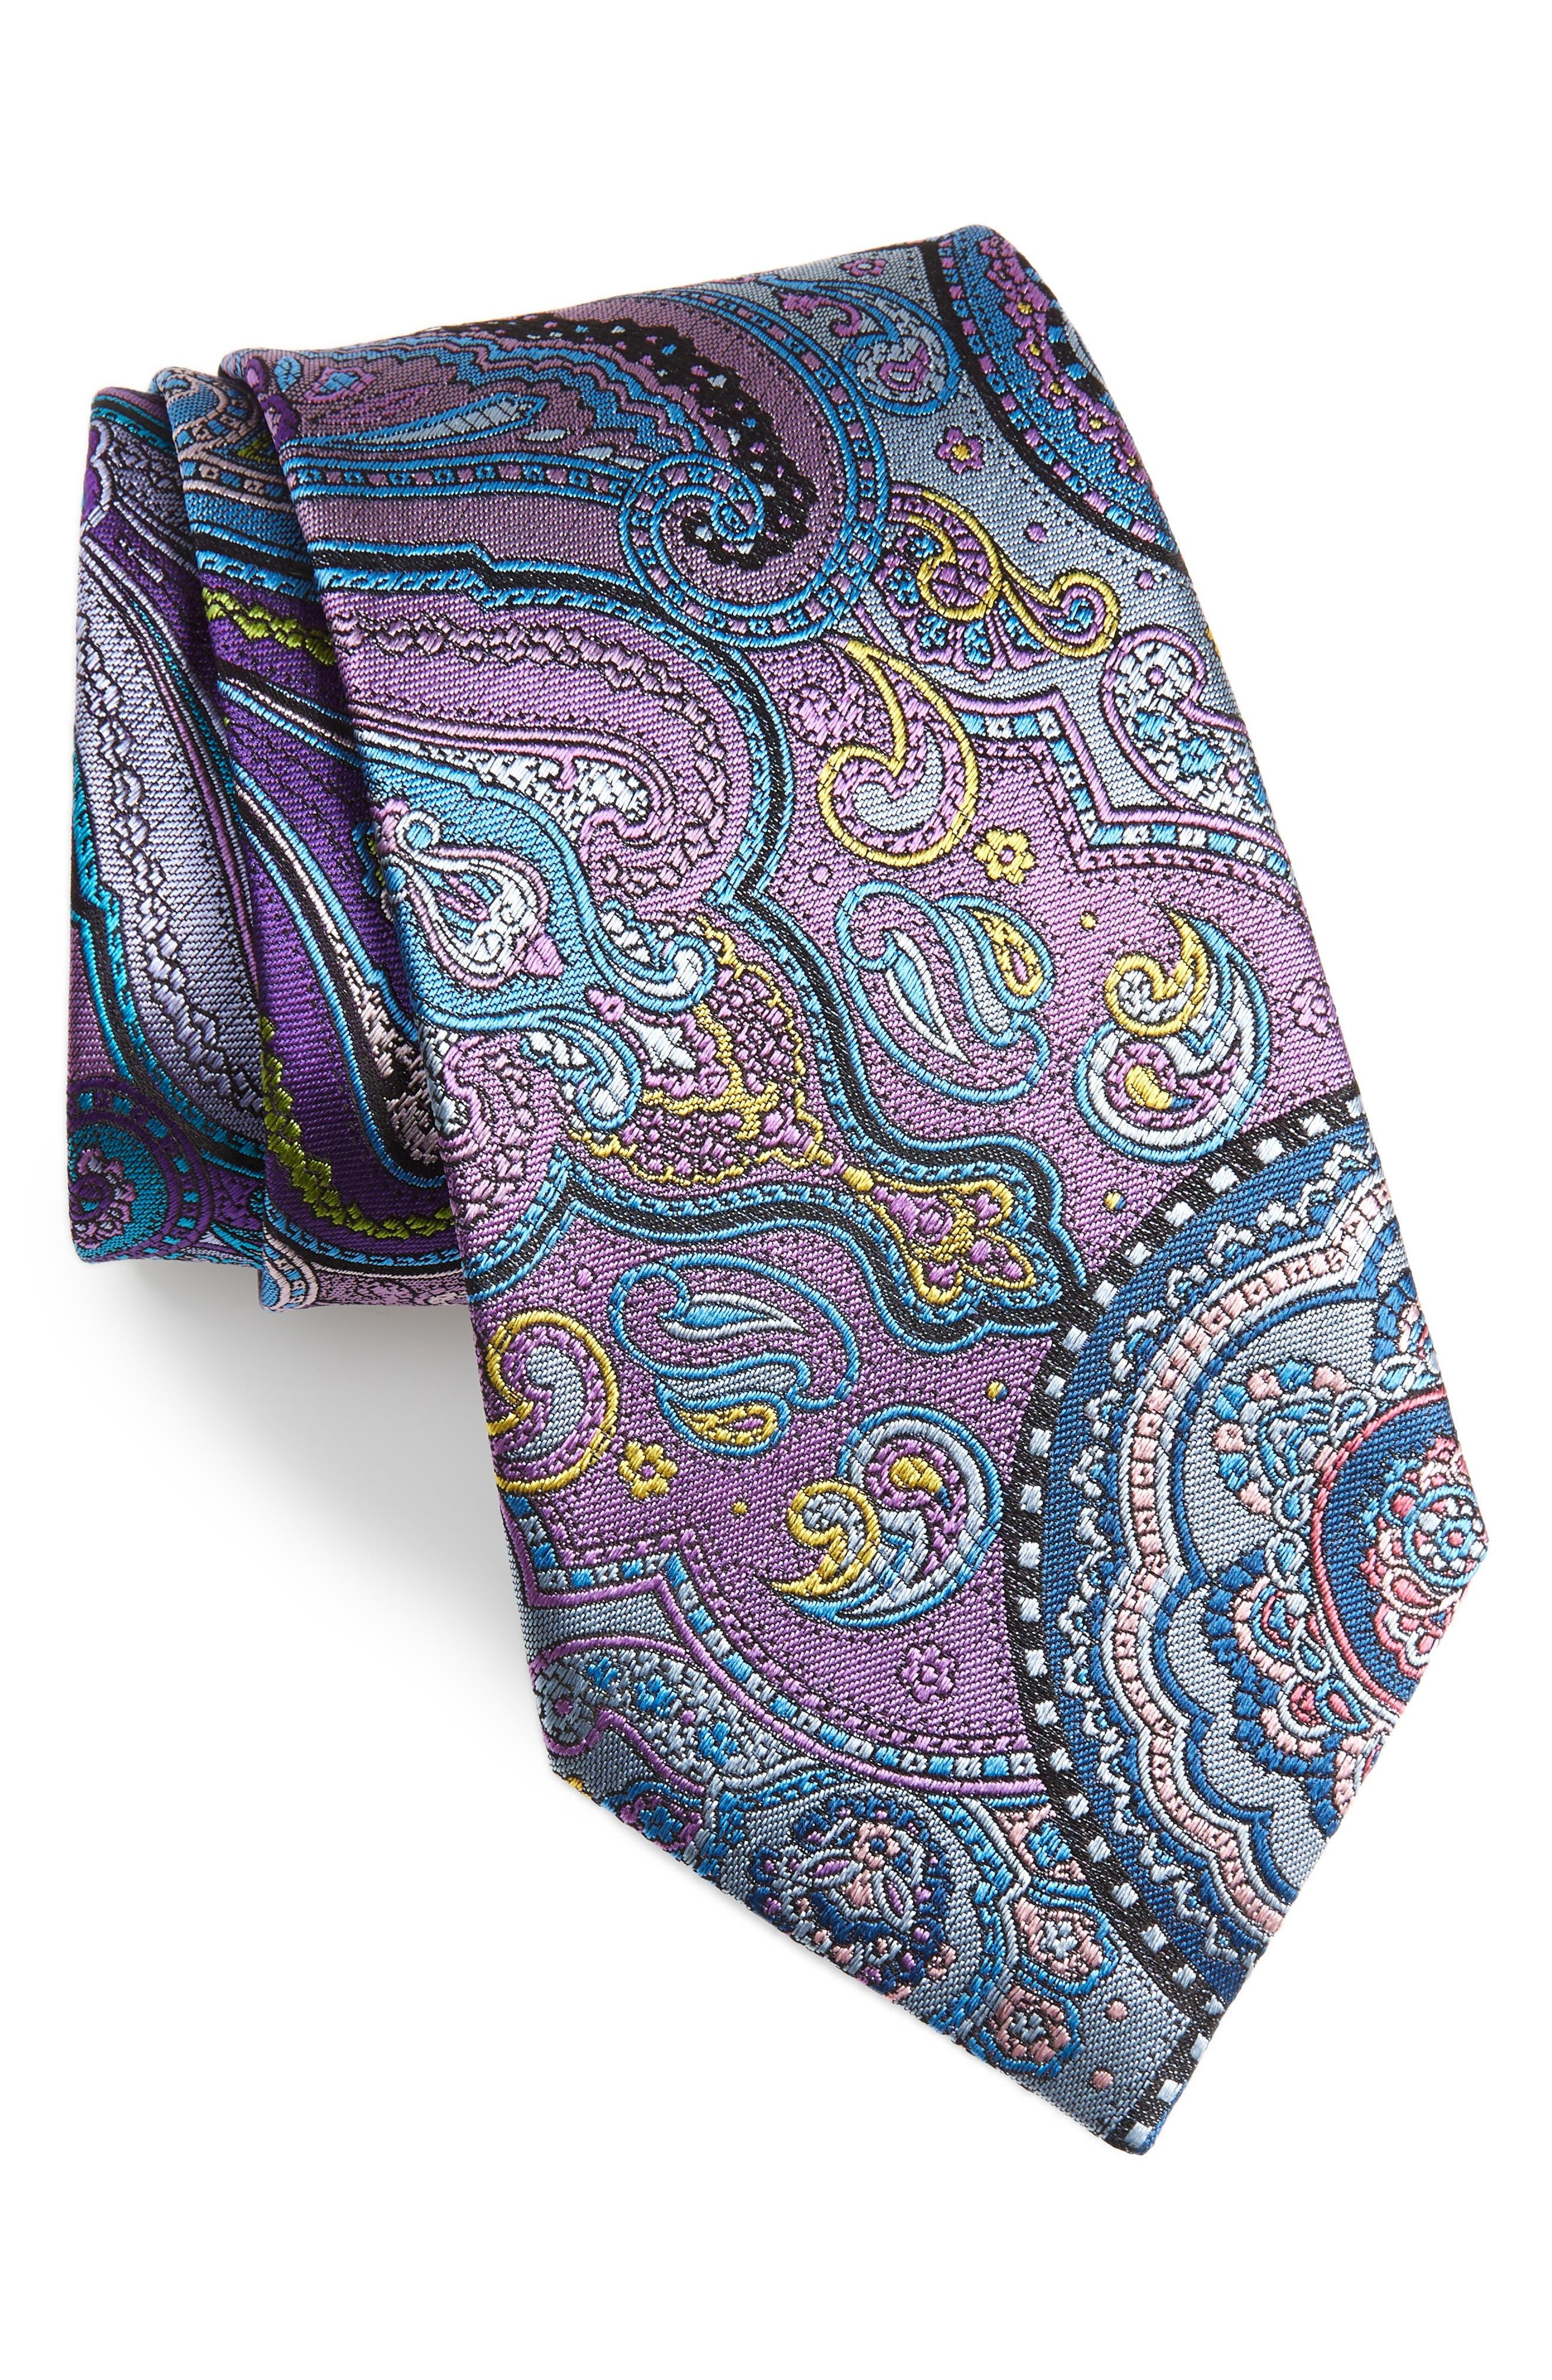 ERMENEGILDO ZEGNA, Quindici Paisley Silk Tie, Main thumbnail 1, color, PURPLE